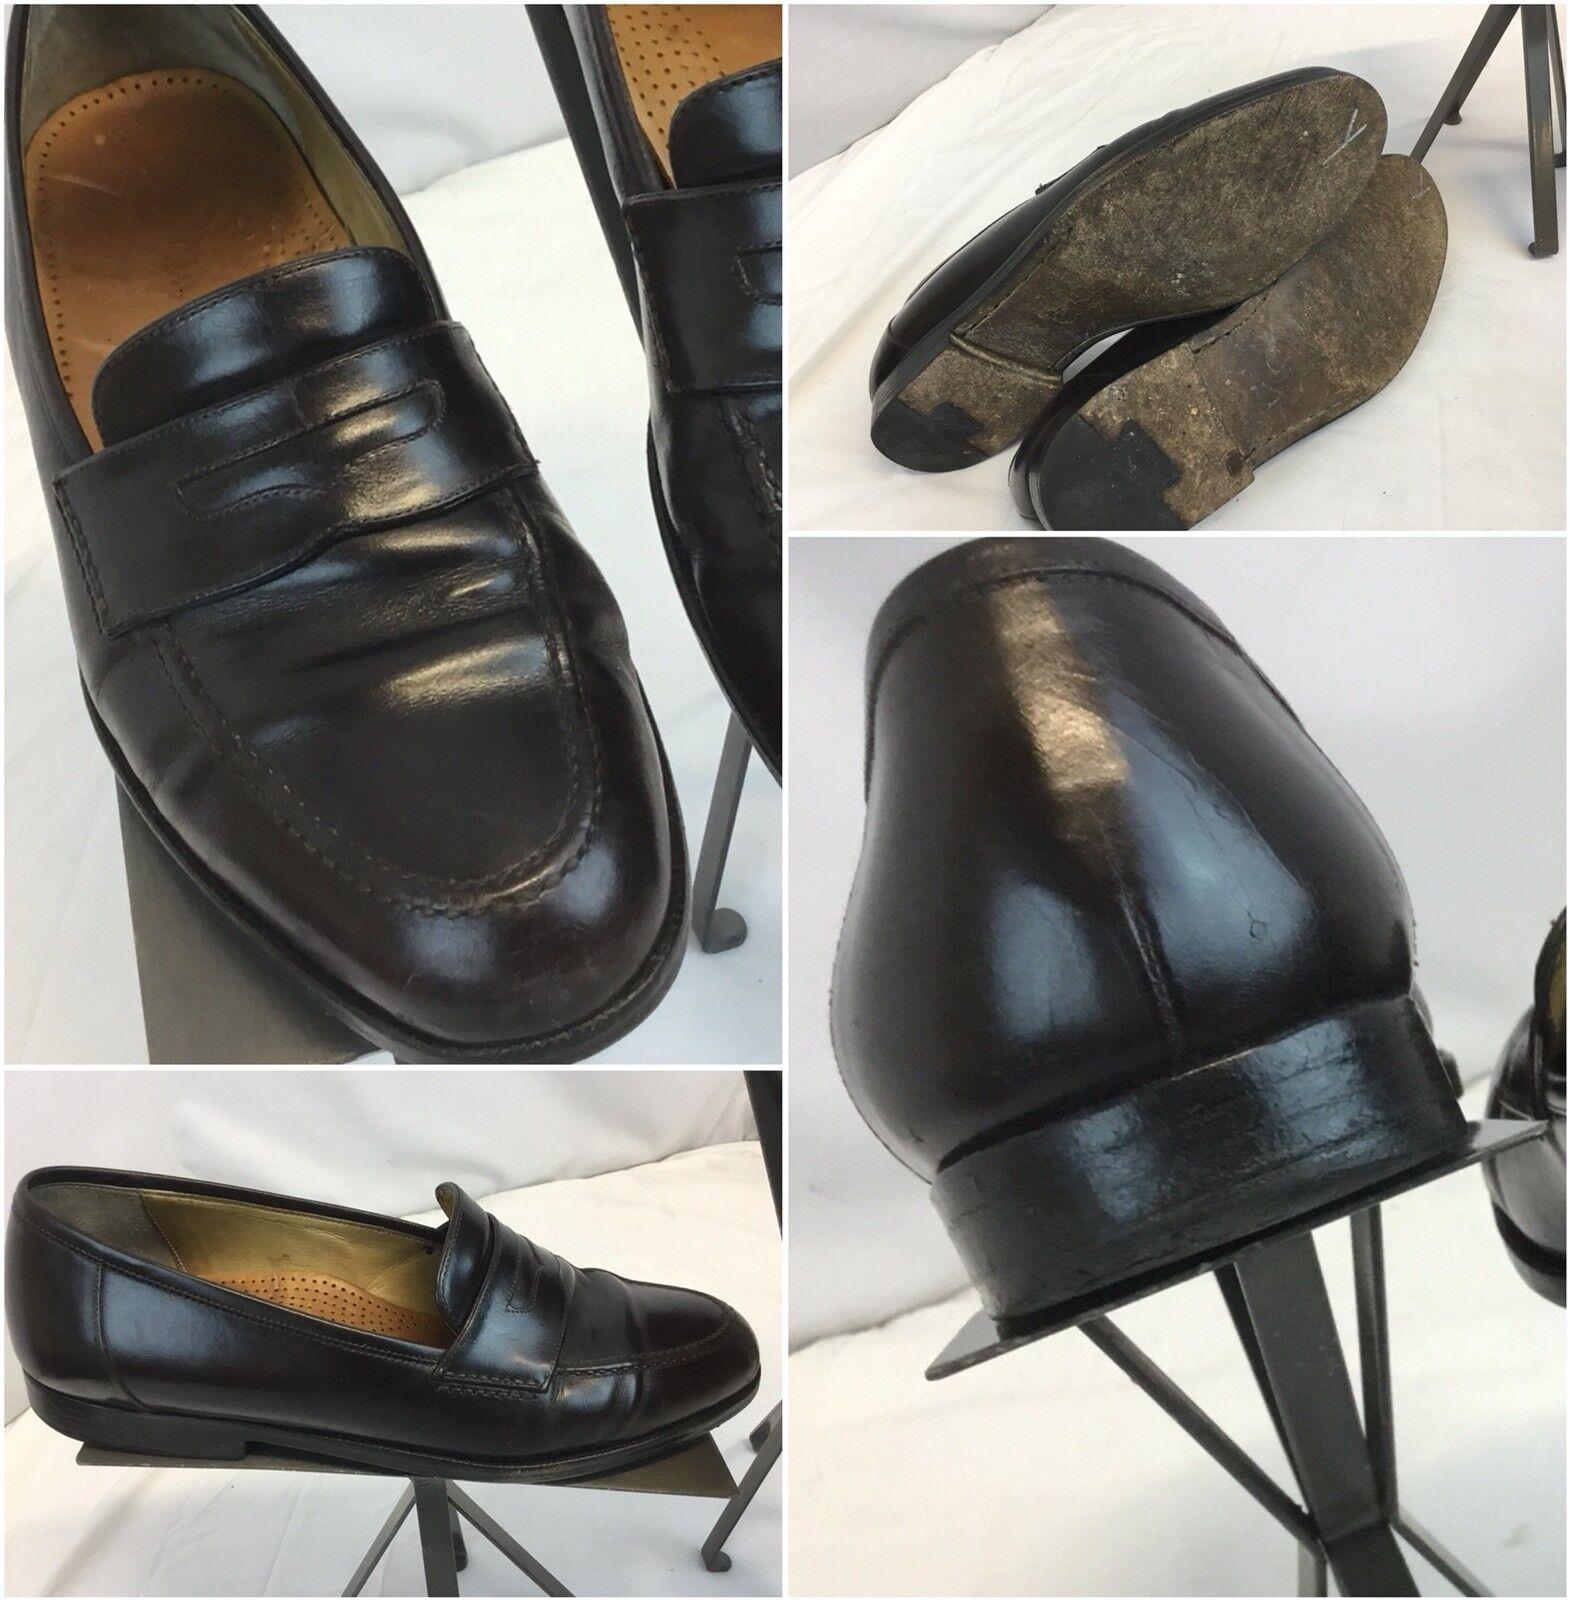 Cole Haan Loafers Shoes Sz 8 D Brown Leather Italy EUC YGI G8 Scarpe classiche da uomo